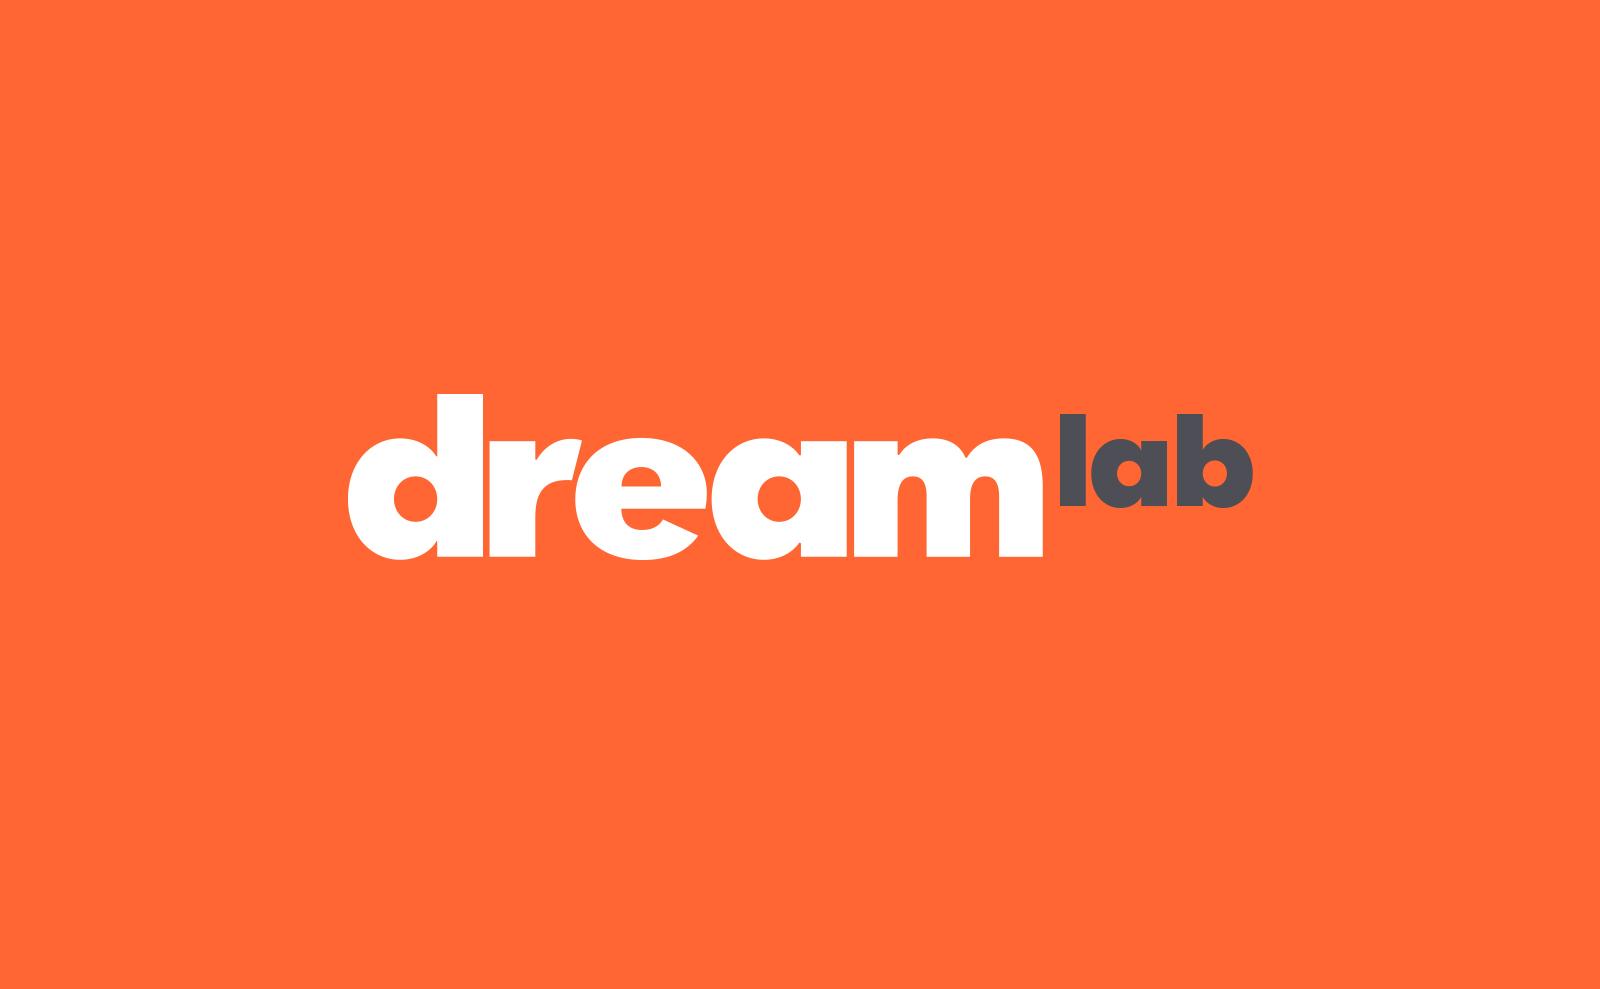 Dream Lab for Amazon DreamLab